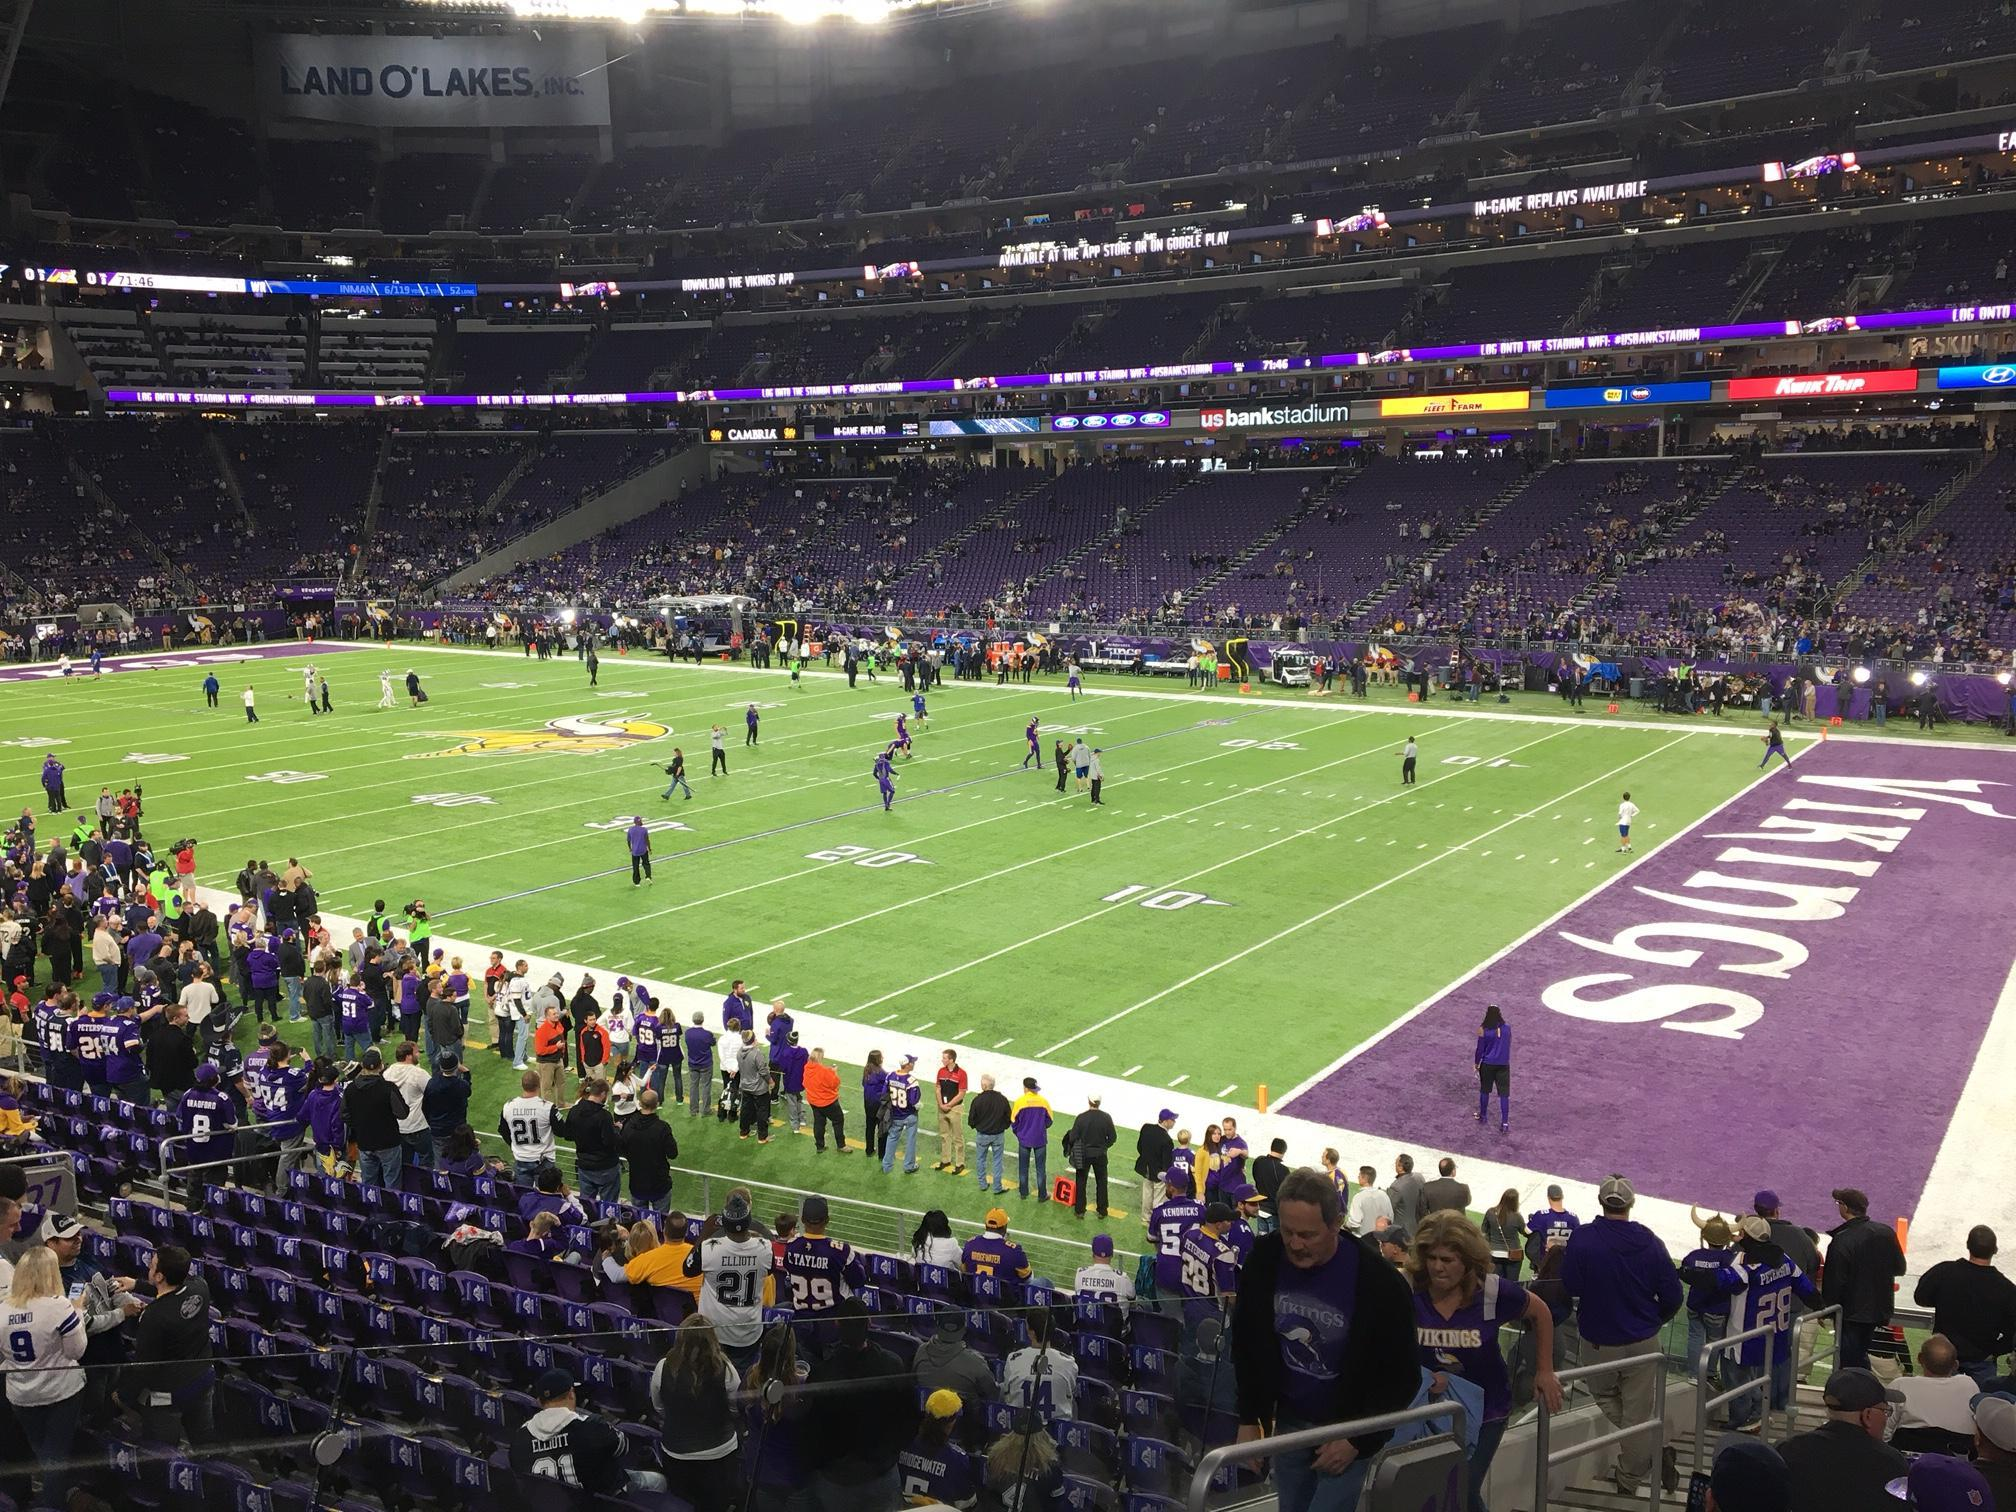 U.S. Bank Stadium Section 124 Row 19 Seat 30